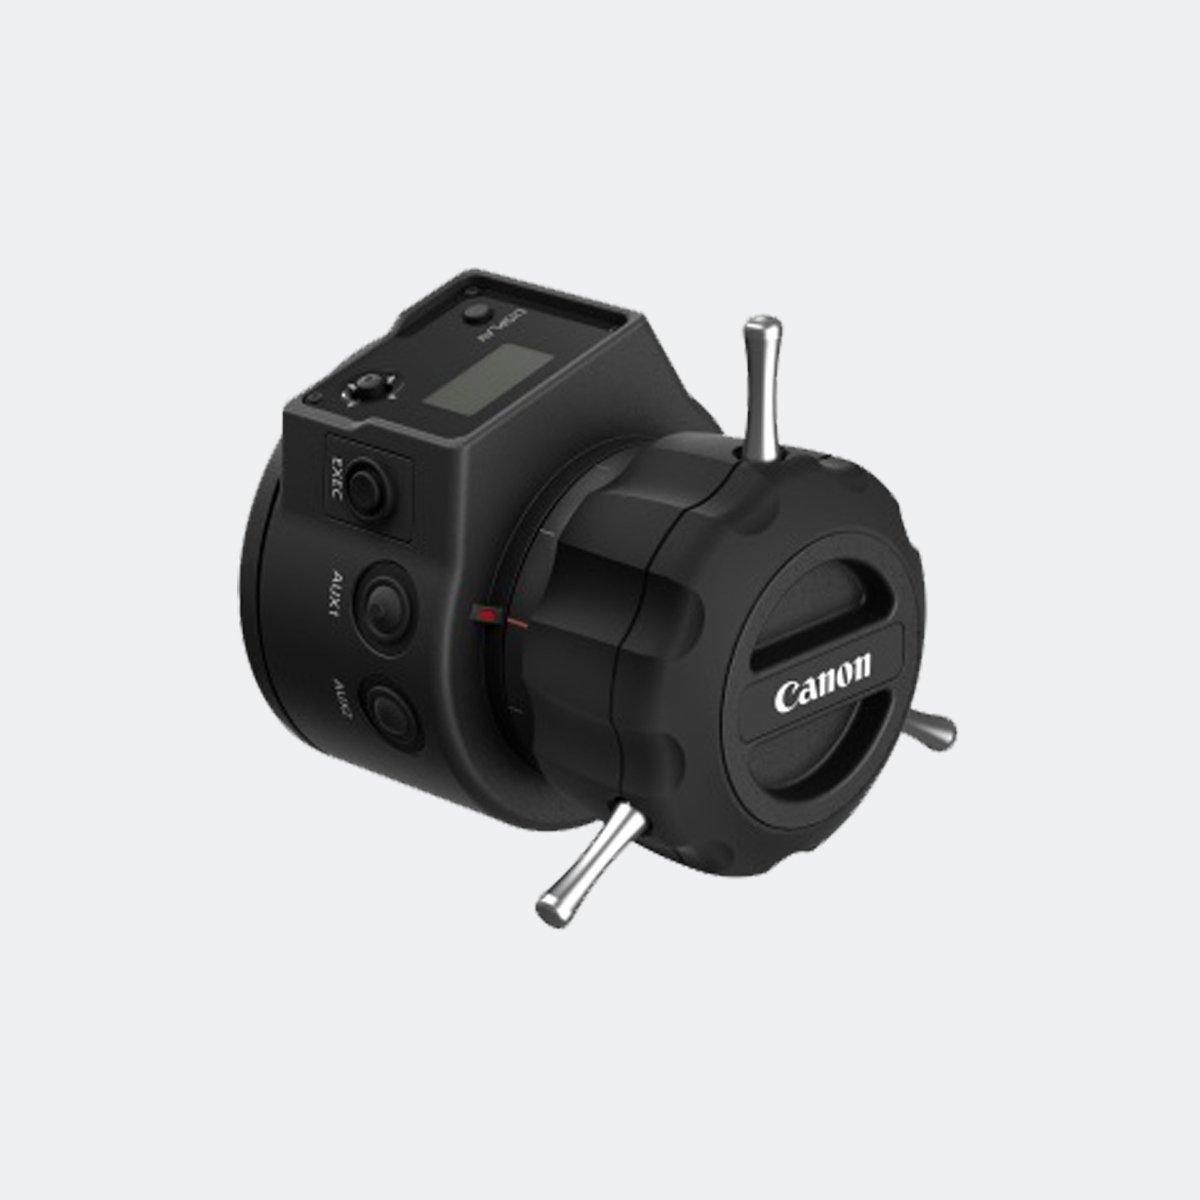 Canon FDJ-G01 Focus demand